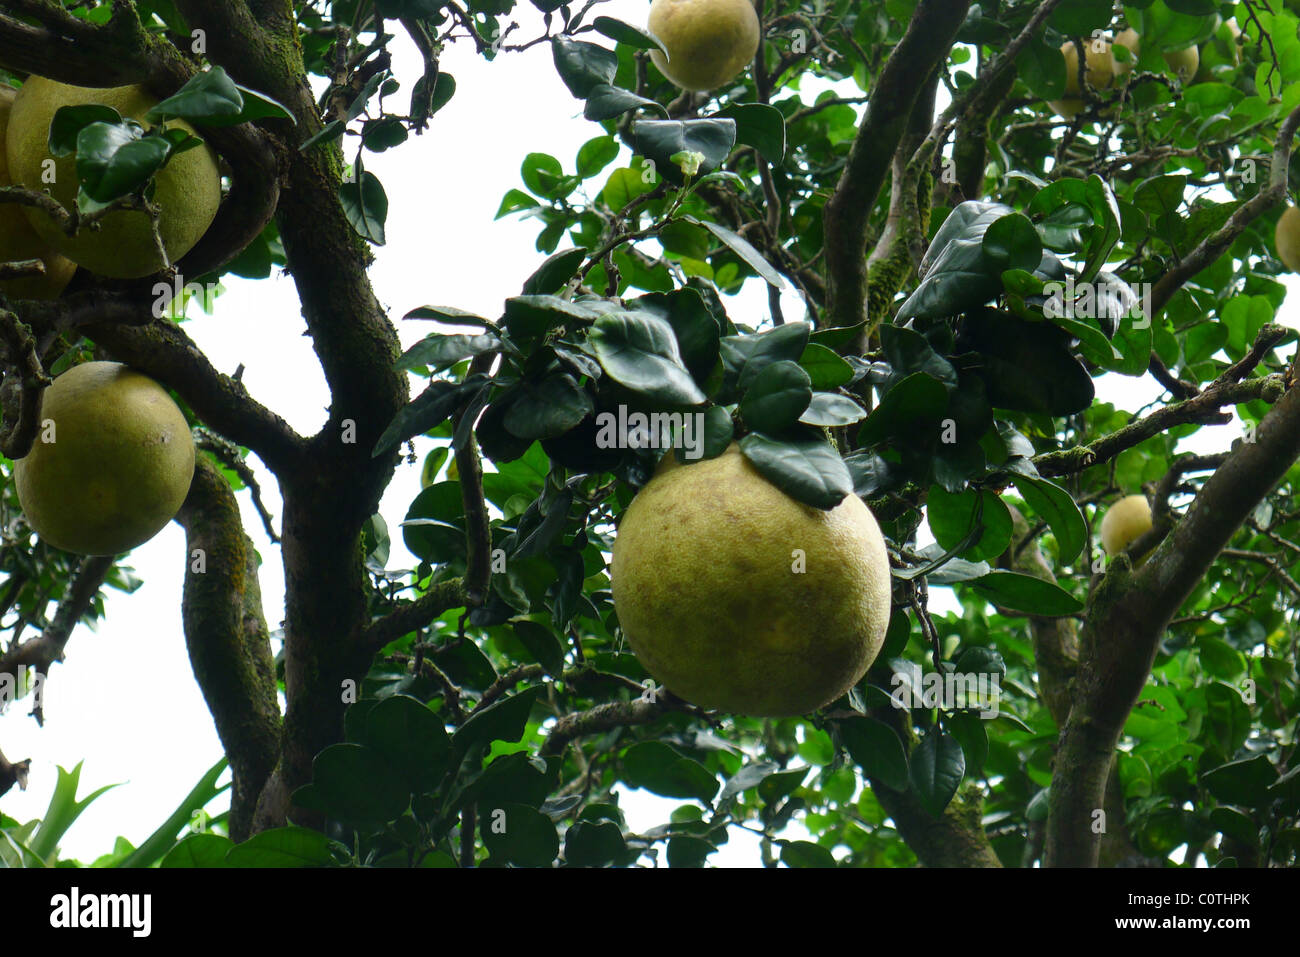 Pomela Fruit tree, Lyon Arboretum, Manoa Vally, Honolulu, Hawaii - Stock Image